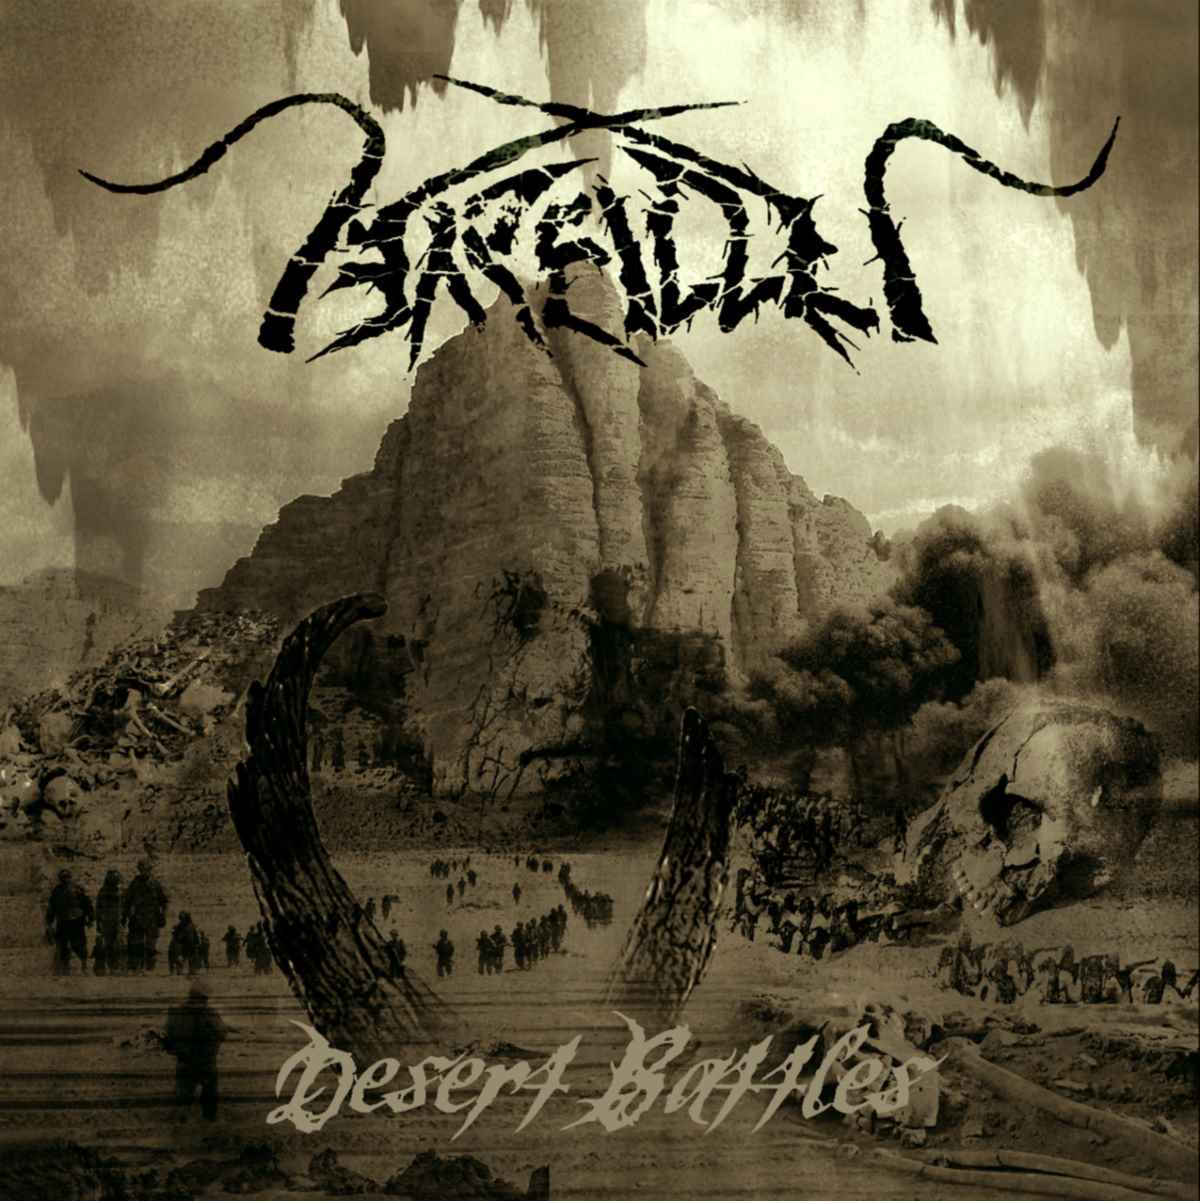 Arallu - Desert - Battles - album cover